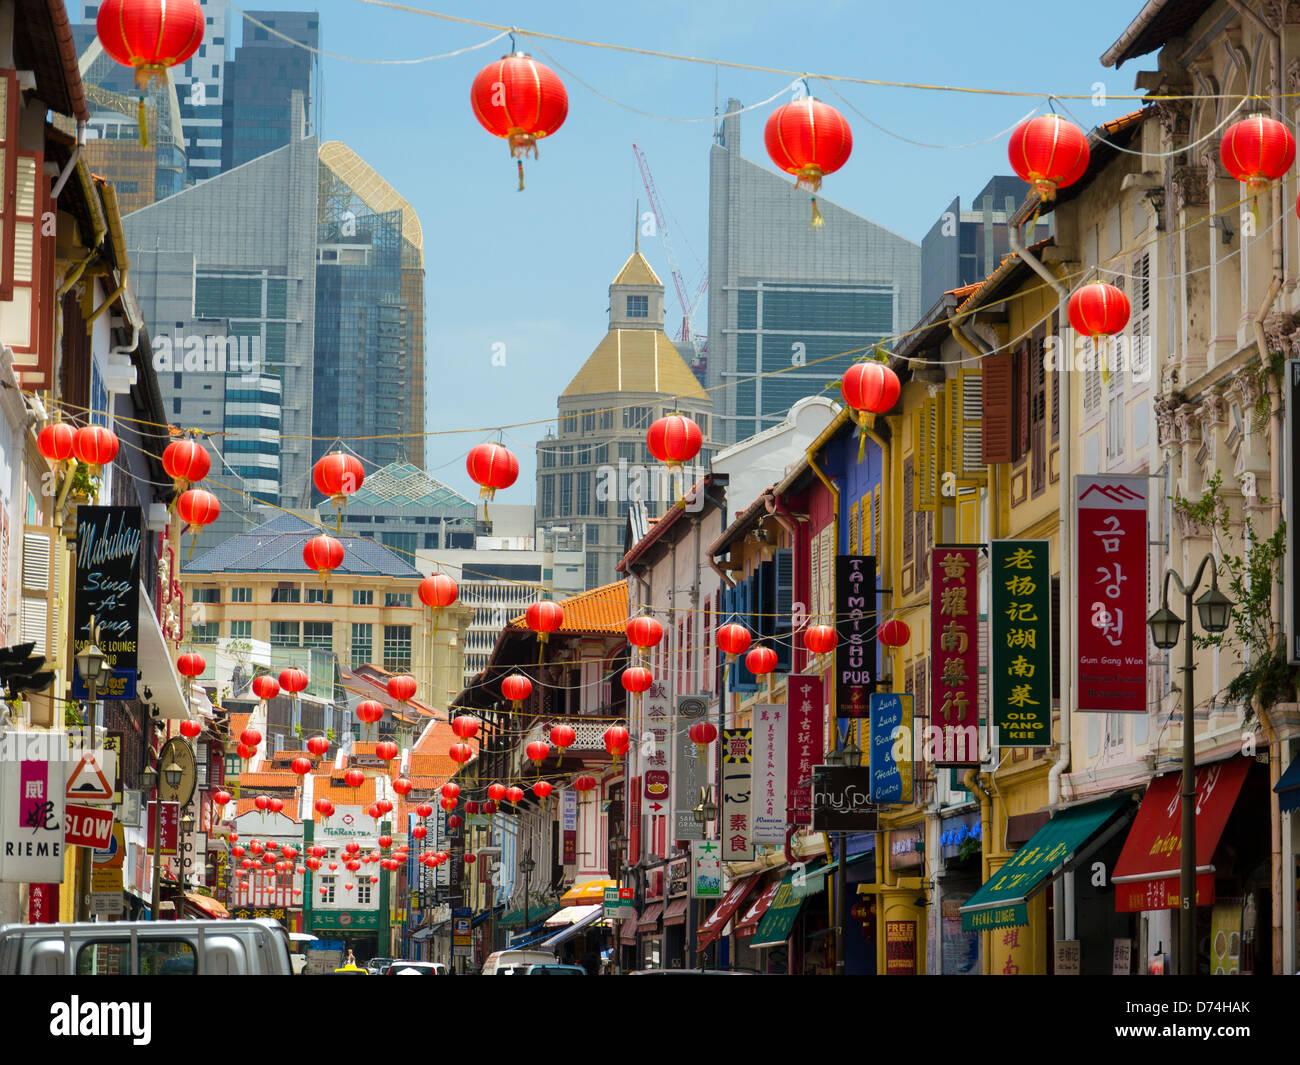 Lanternes chinoises, China Town, à Singapour, en Asie Photo Stock